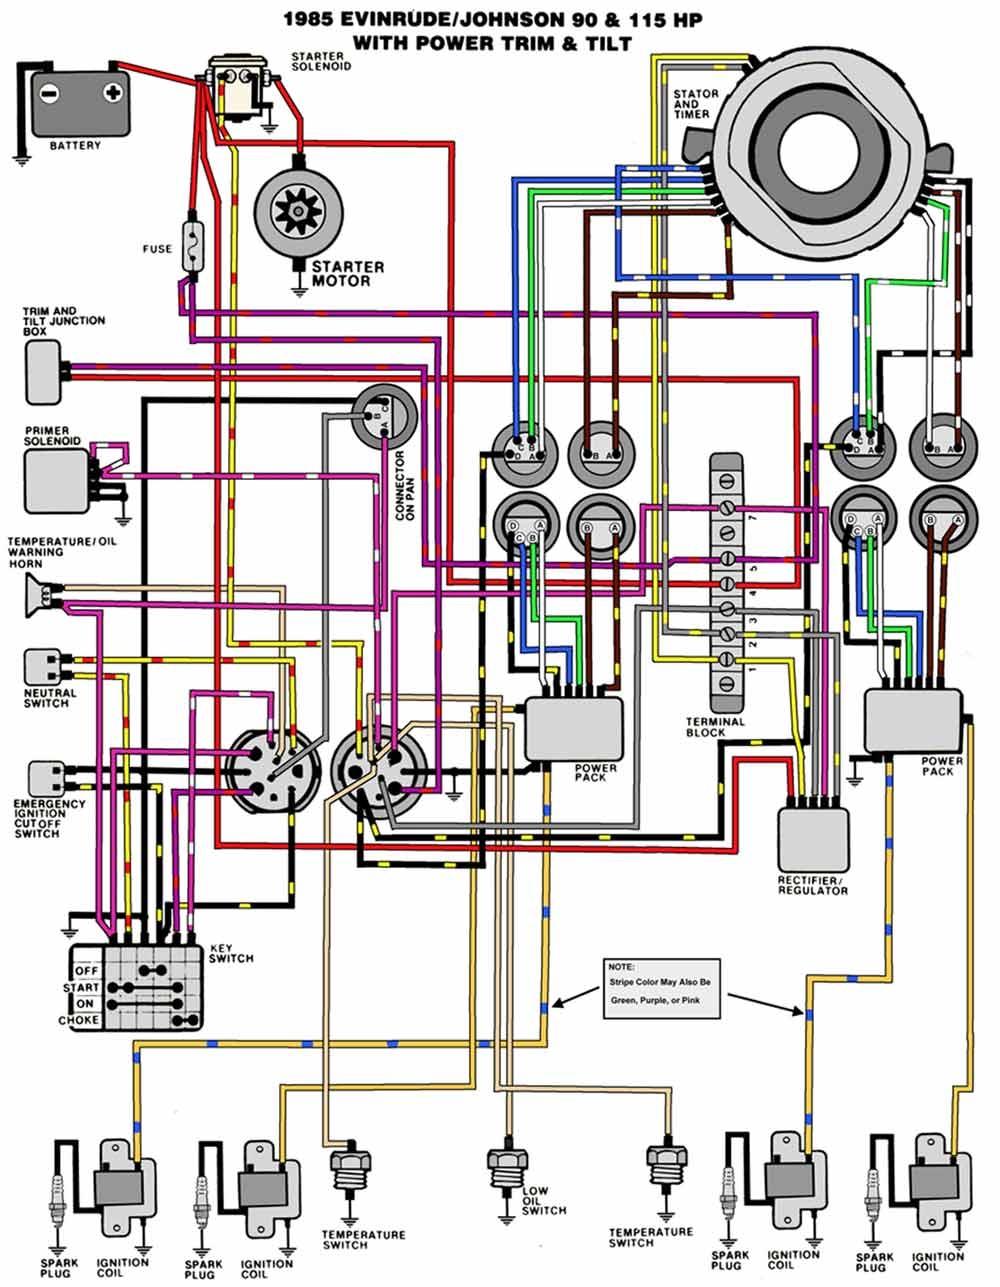 yamaha outboard key switch wiring diagram johnson outboard ignition switch wiring diagram | free ... johnson key switch wiring diagram